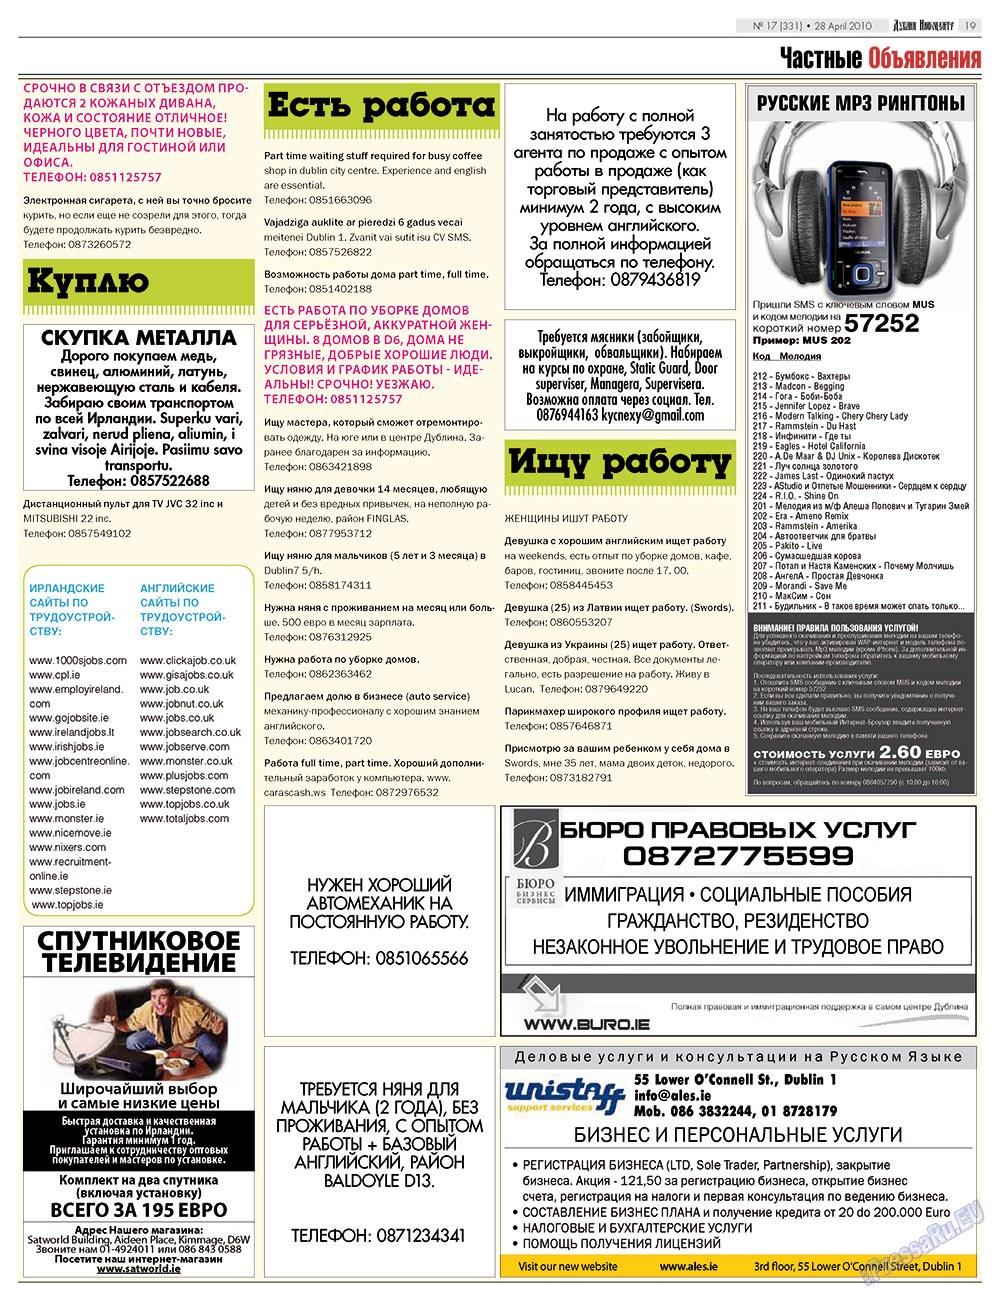 Дублин инфоцентр (газета). 2010 год, номер 17, стр. 19